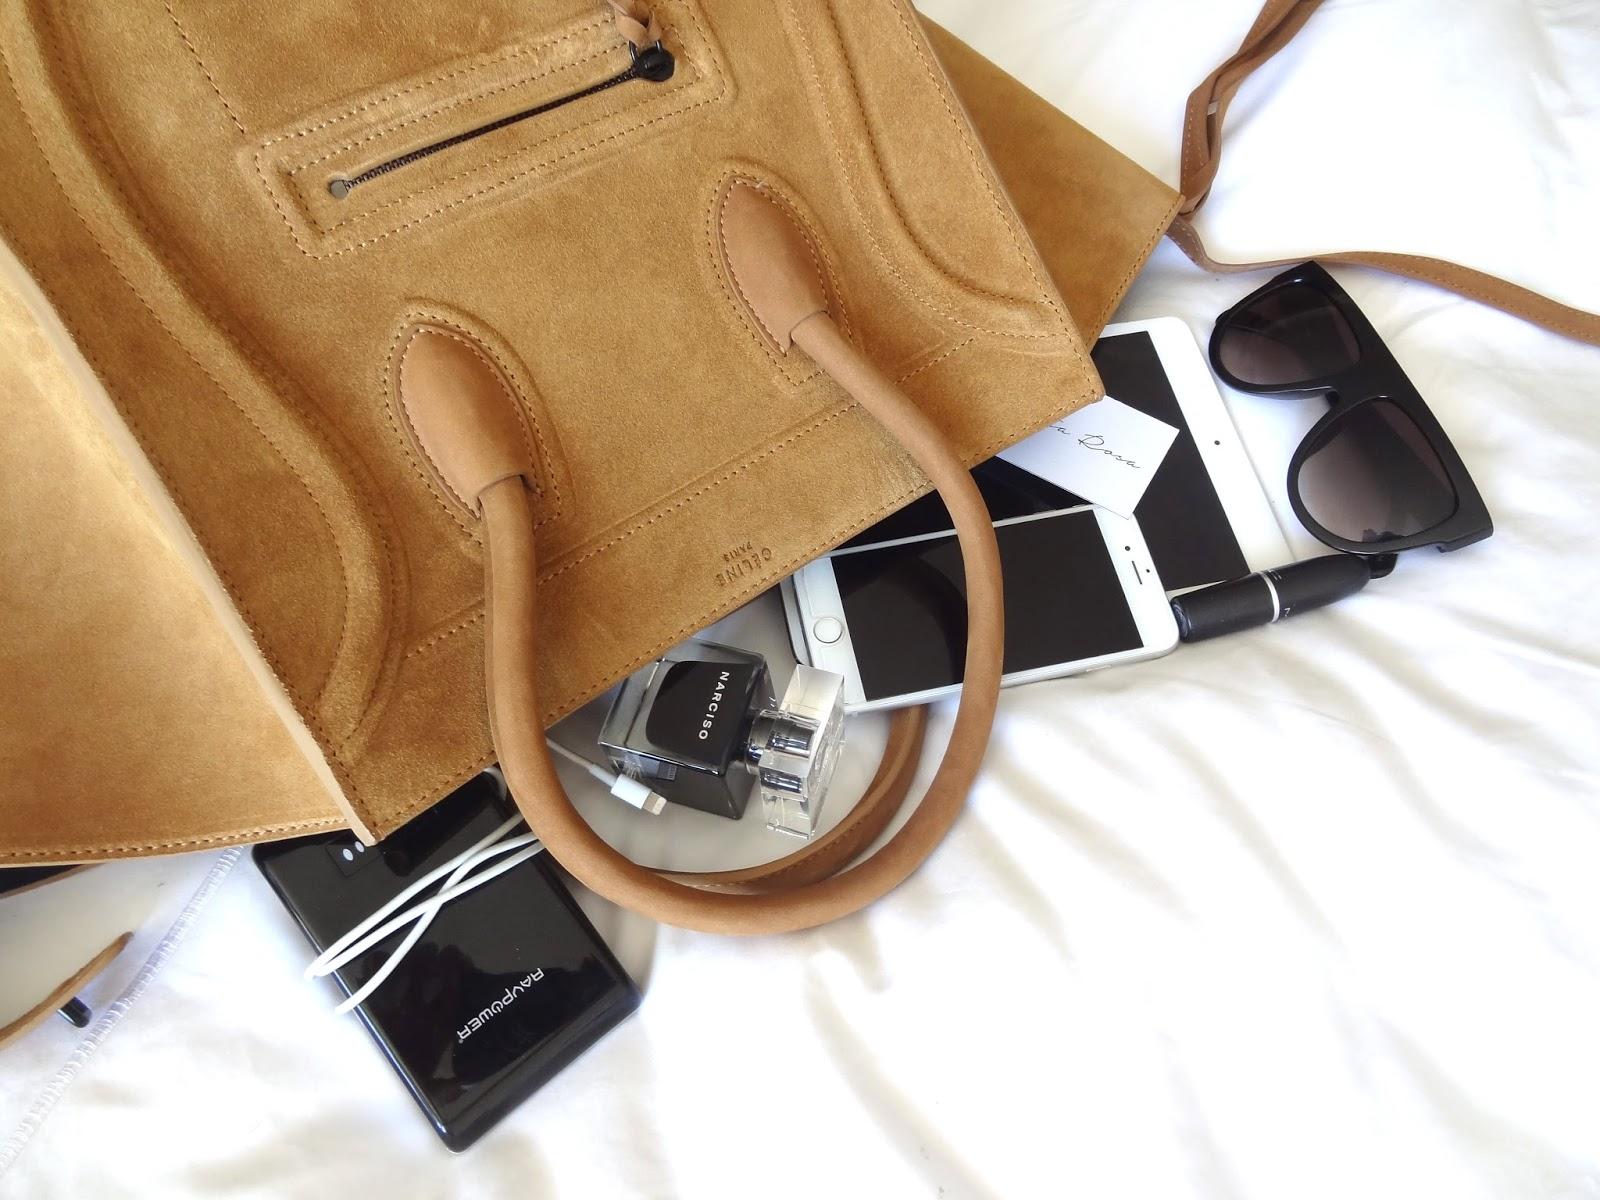 best celine replica - Claudia Rosa Blog - Luxury Lifestyle: WHAT'S IN MY CELINE PHANTOM ...